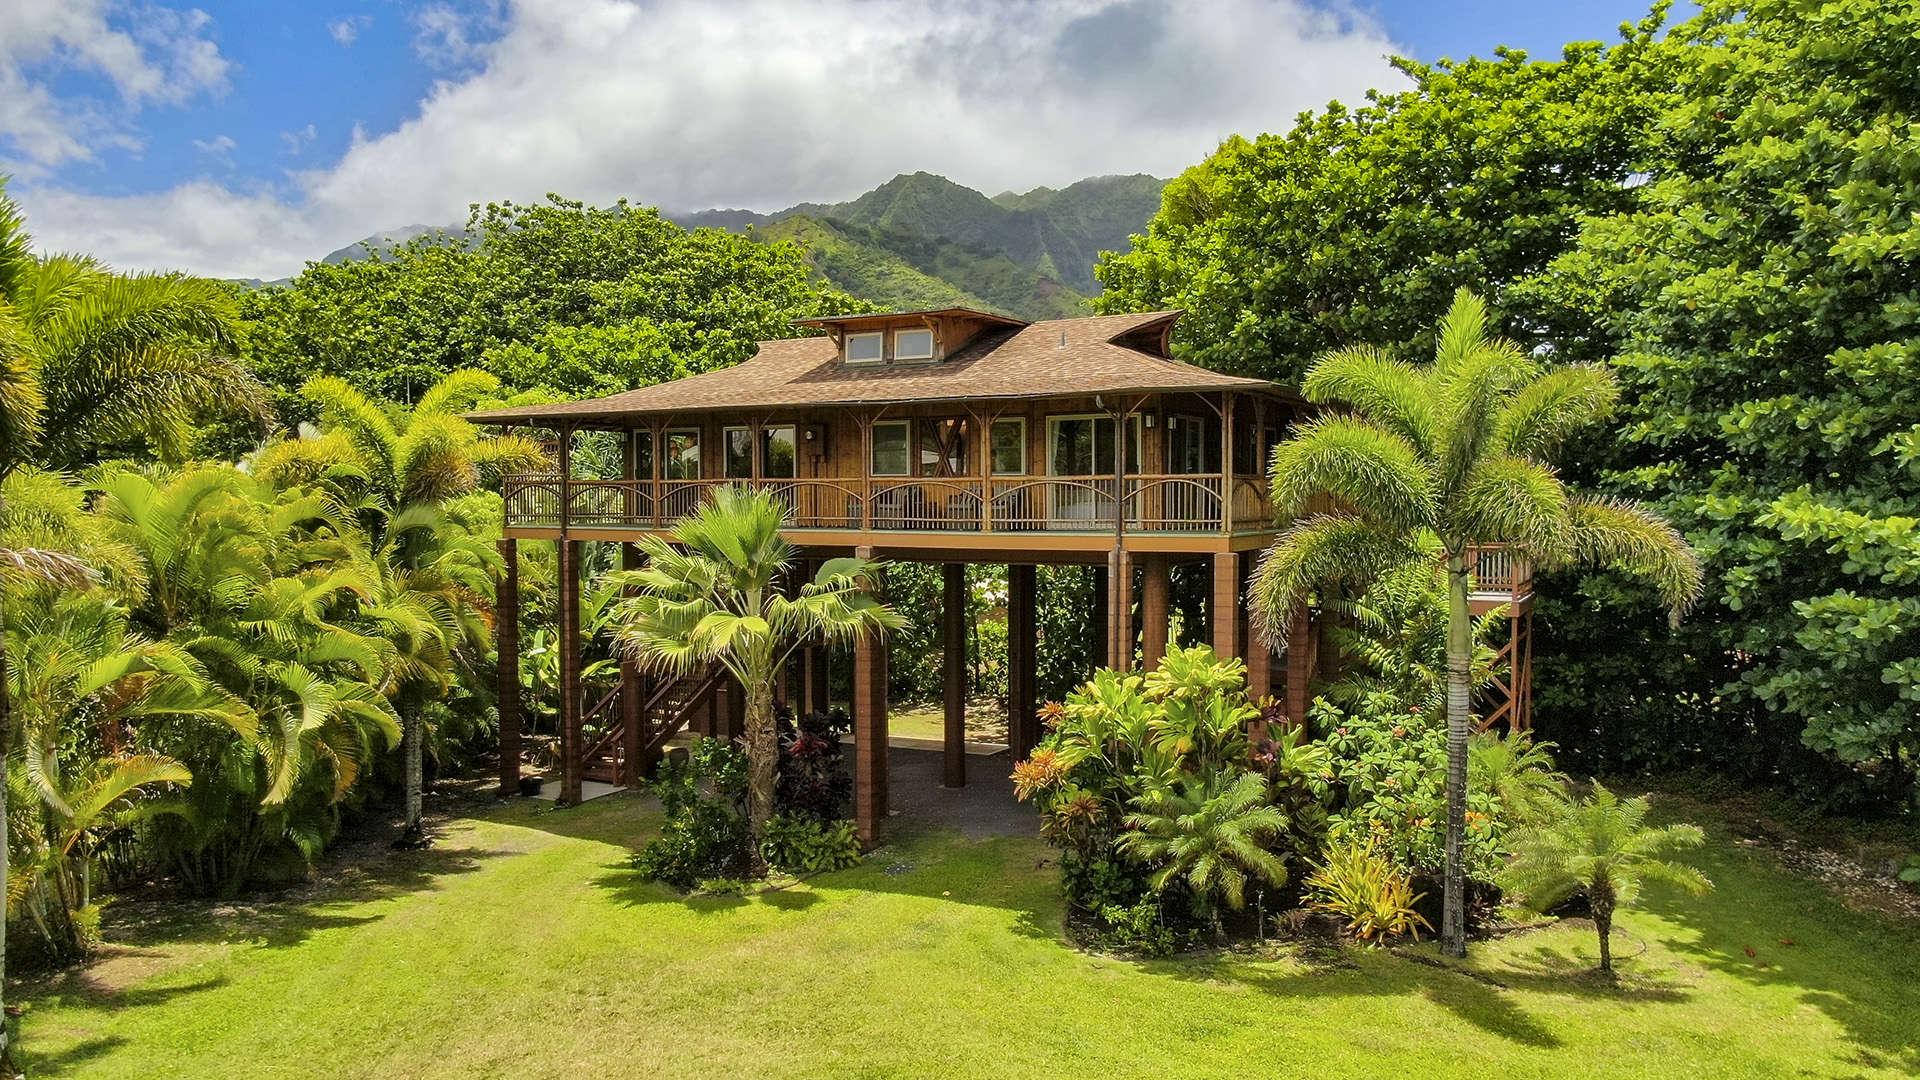 - Tropical Bamboo Hideaway - Image 1/15